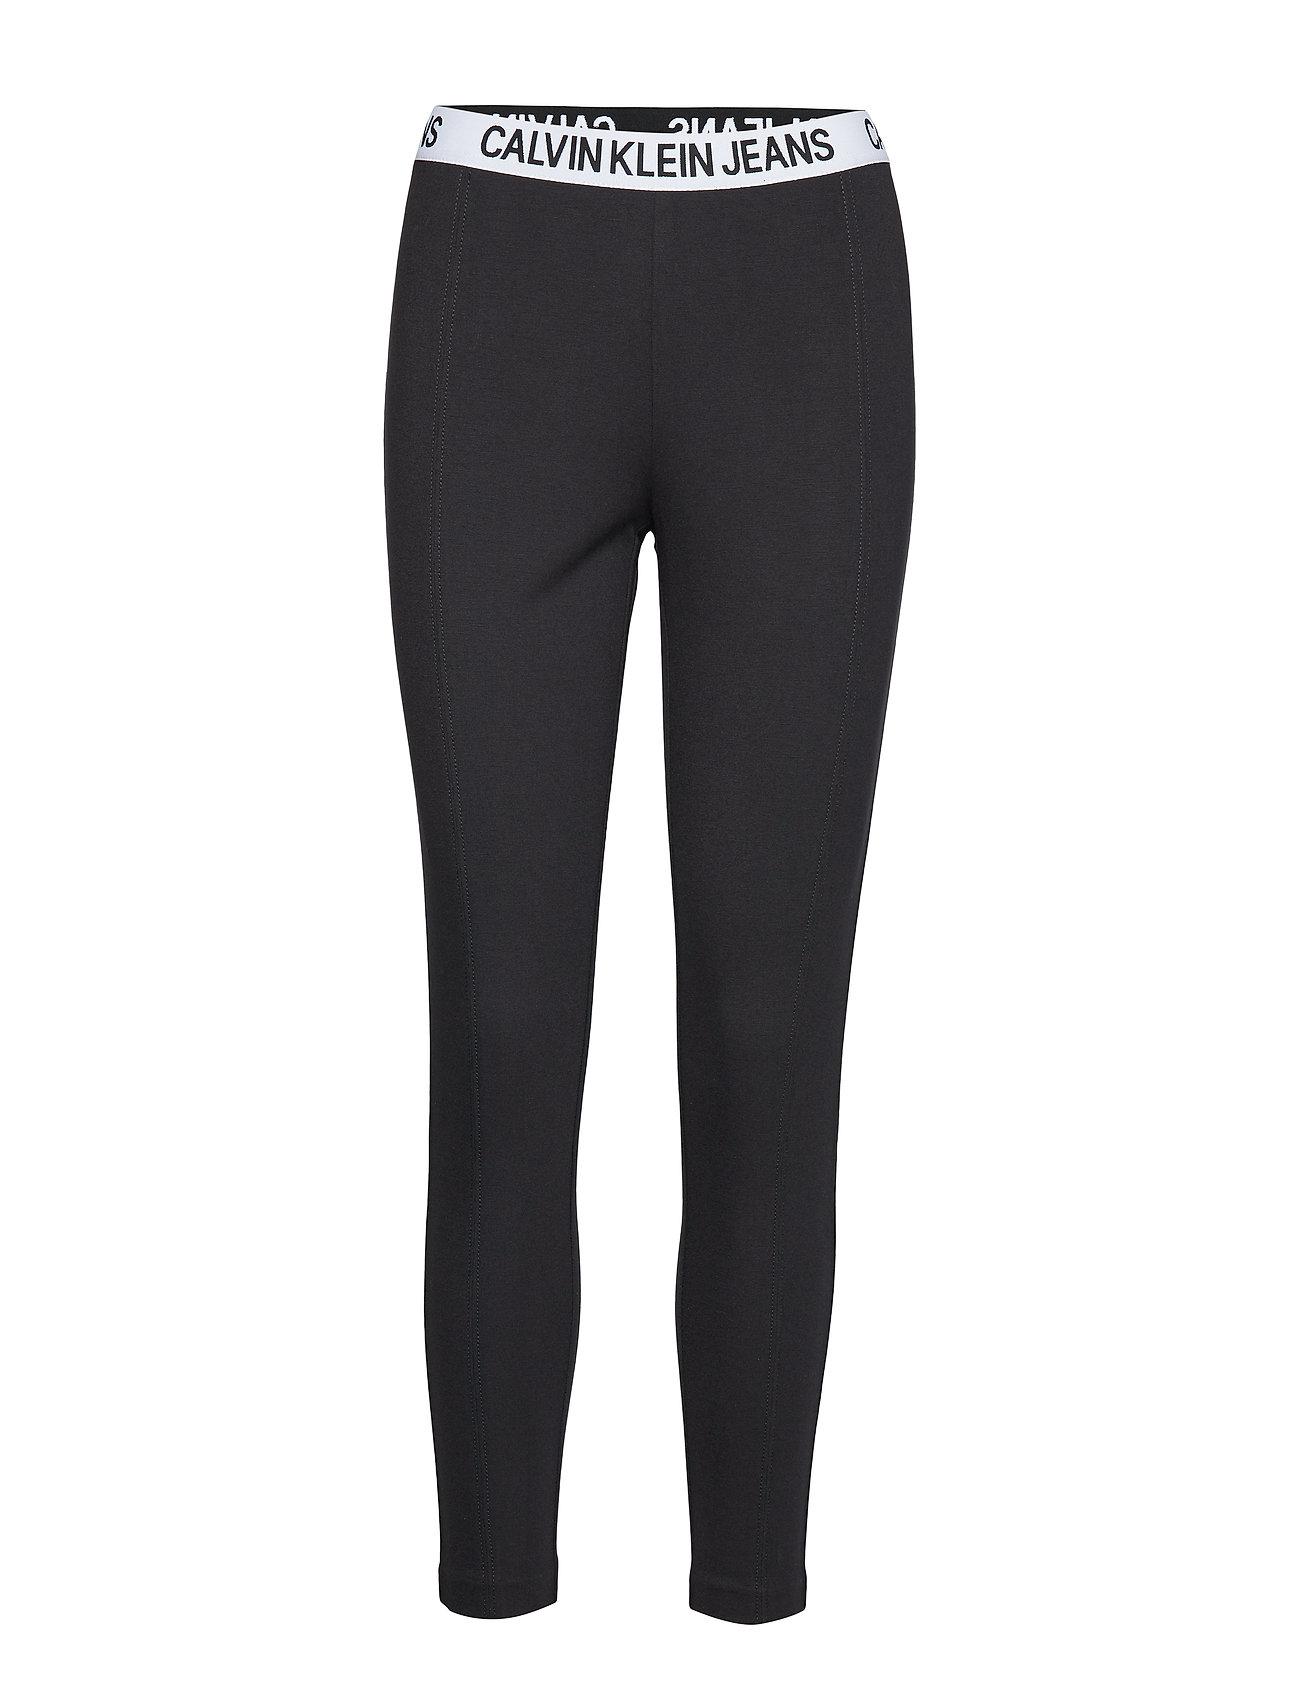 Calvin Klein Jeans MILANO LEGGINGS - CK BLACK